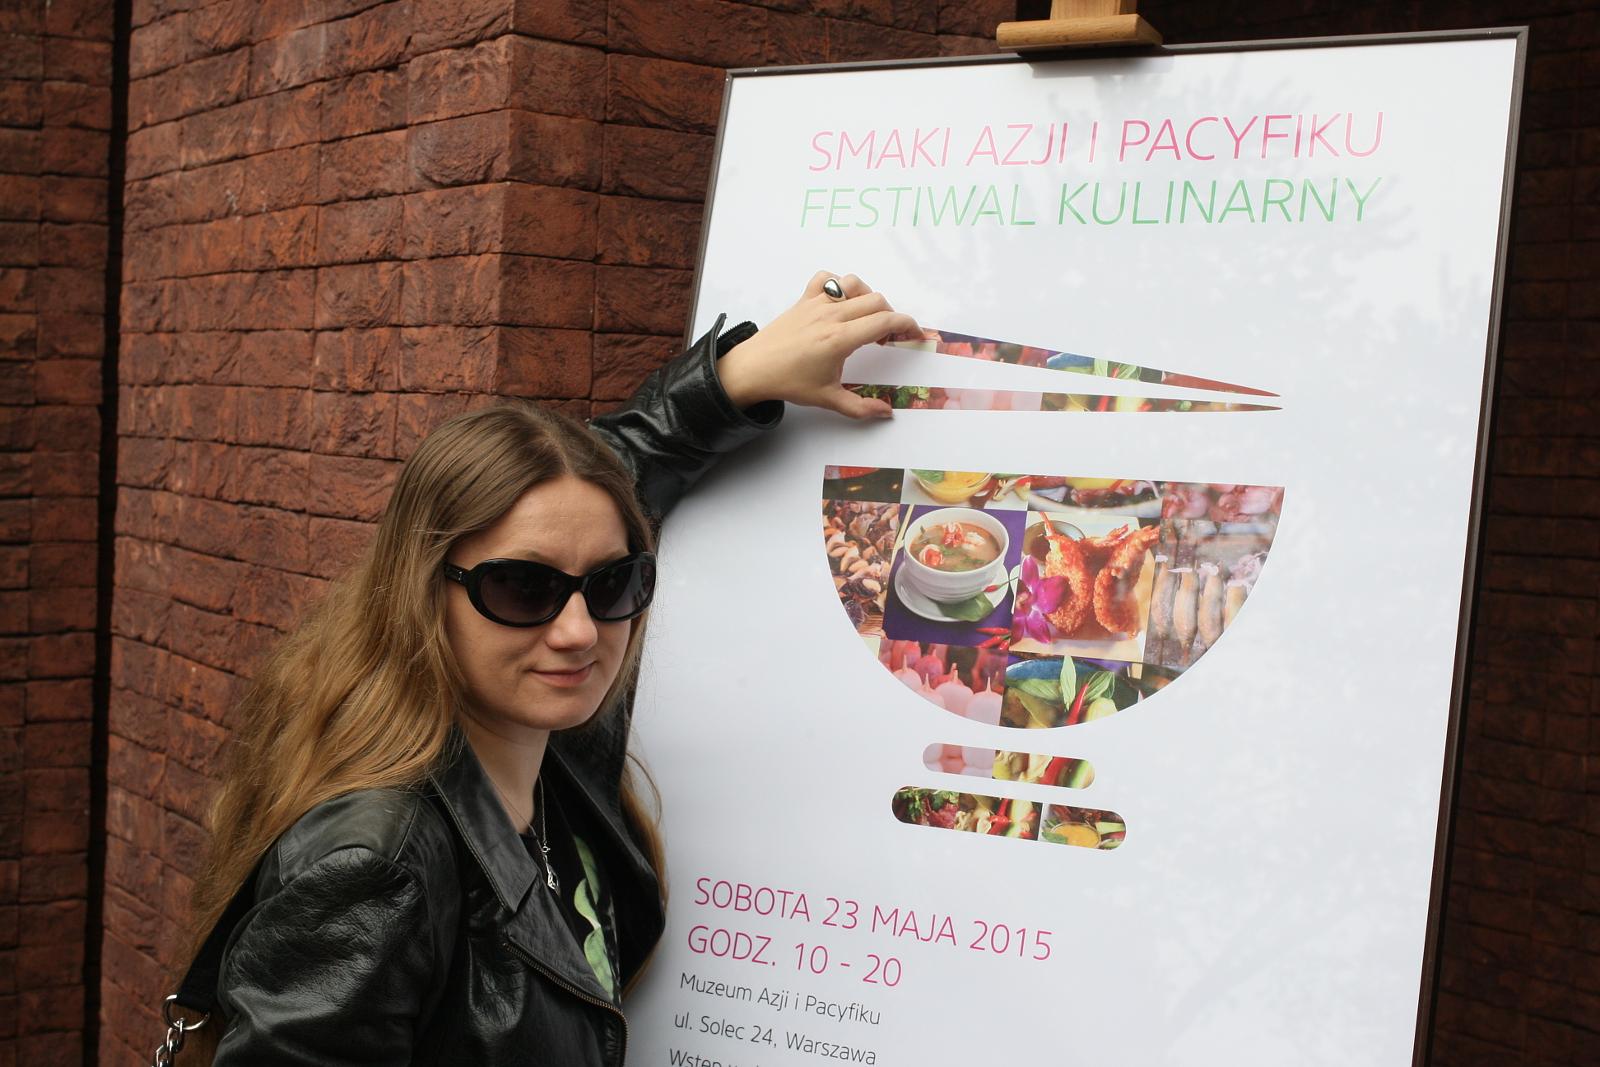 Festiwal Kulinarny Smaki Azji iPacyfiku